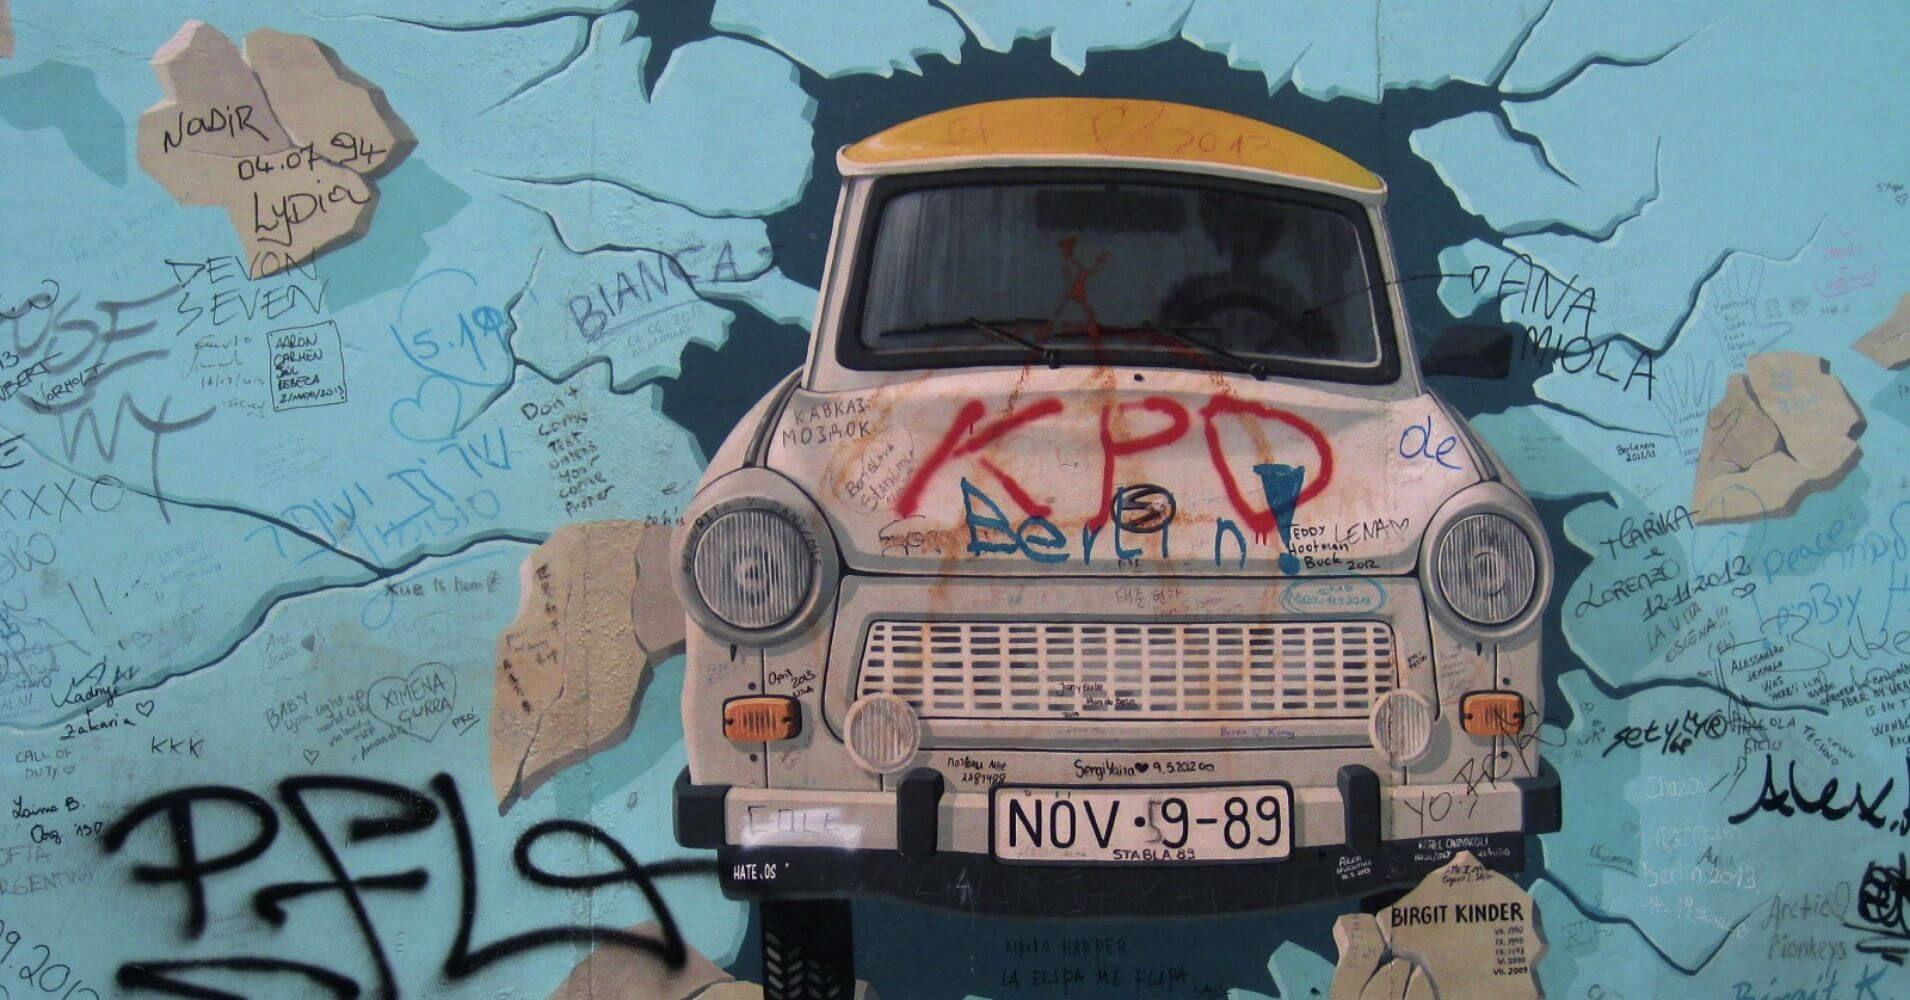 East Side Gallery. Muro de Berlín. Alemania.